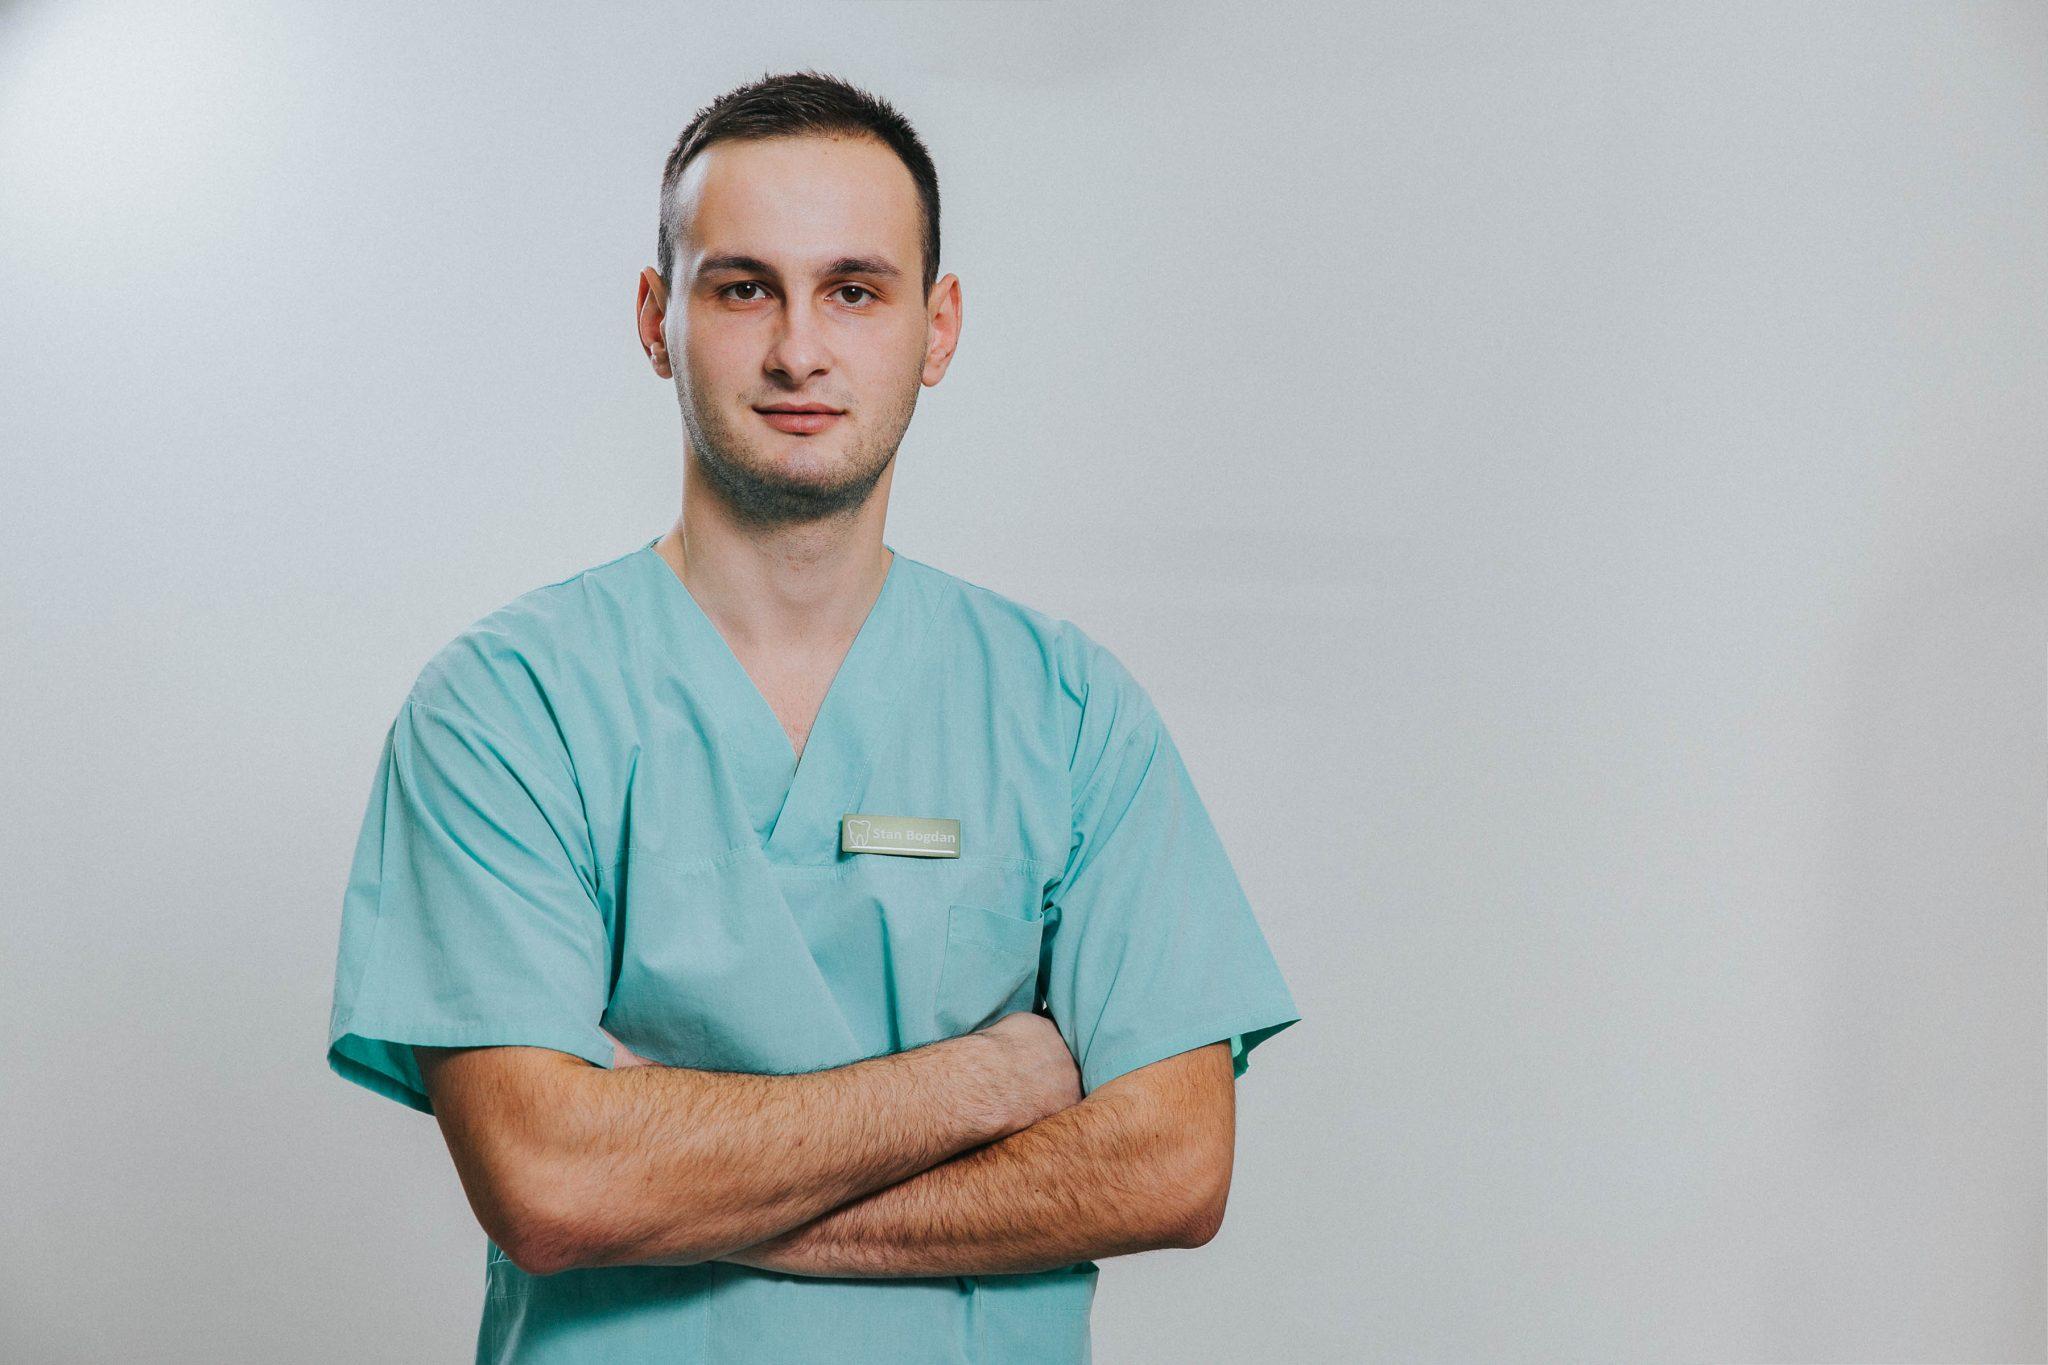 facultatea de stamatologie targu mures UMF absolvenit stamatolog medic doctor fotografie comerciala fotograf profesionist majos daniel_